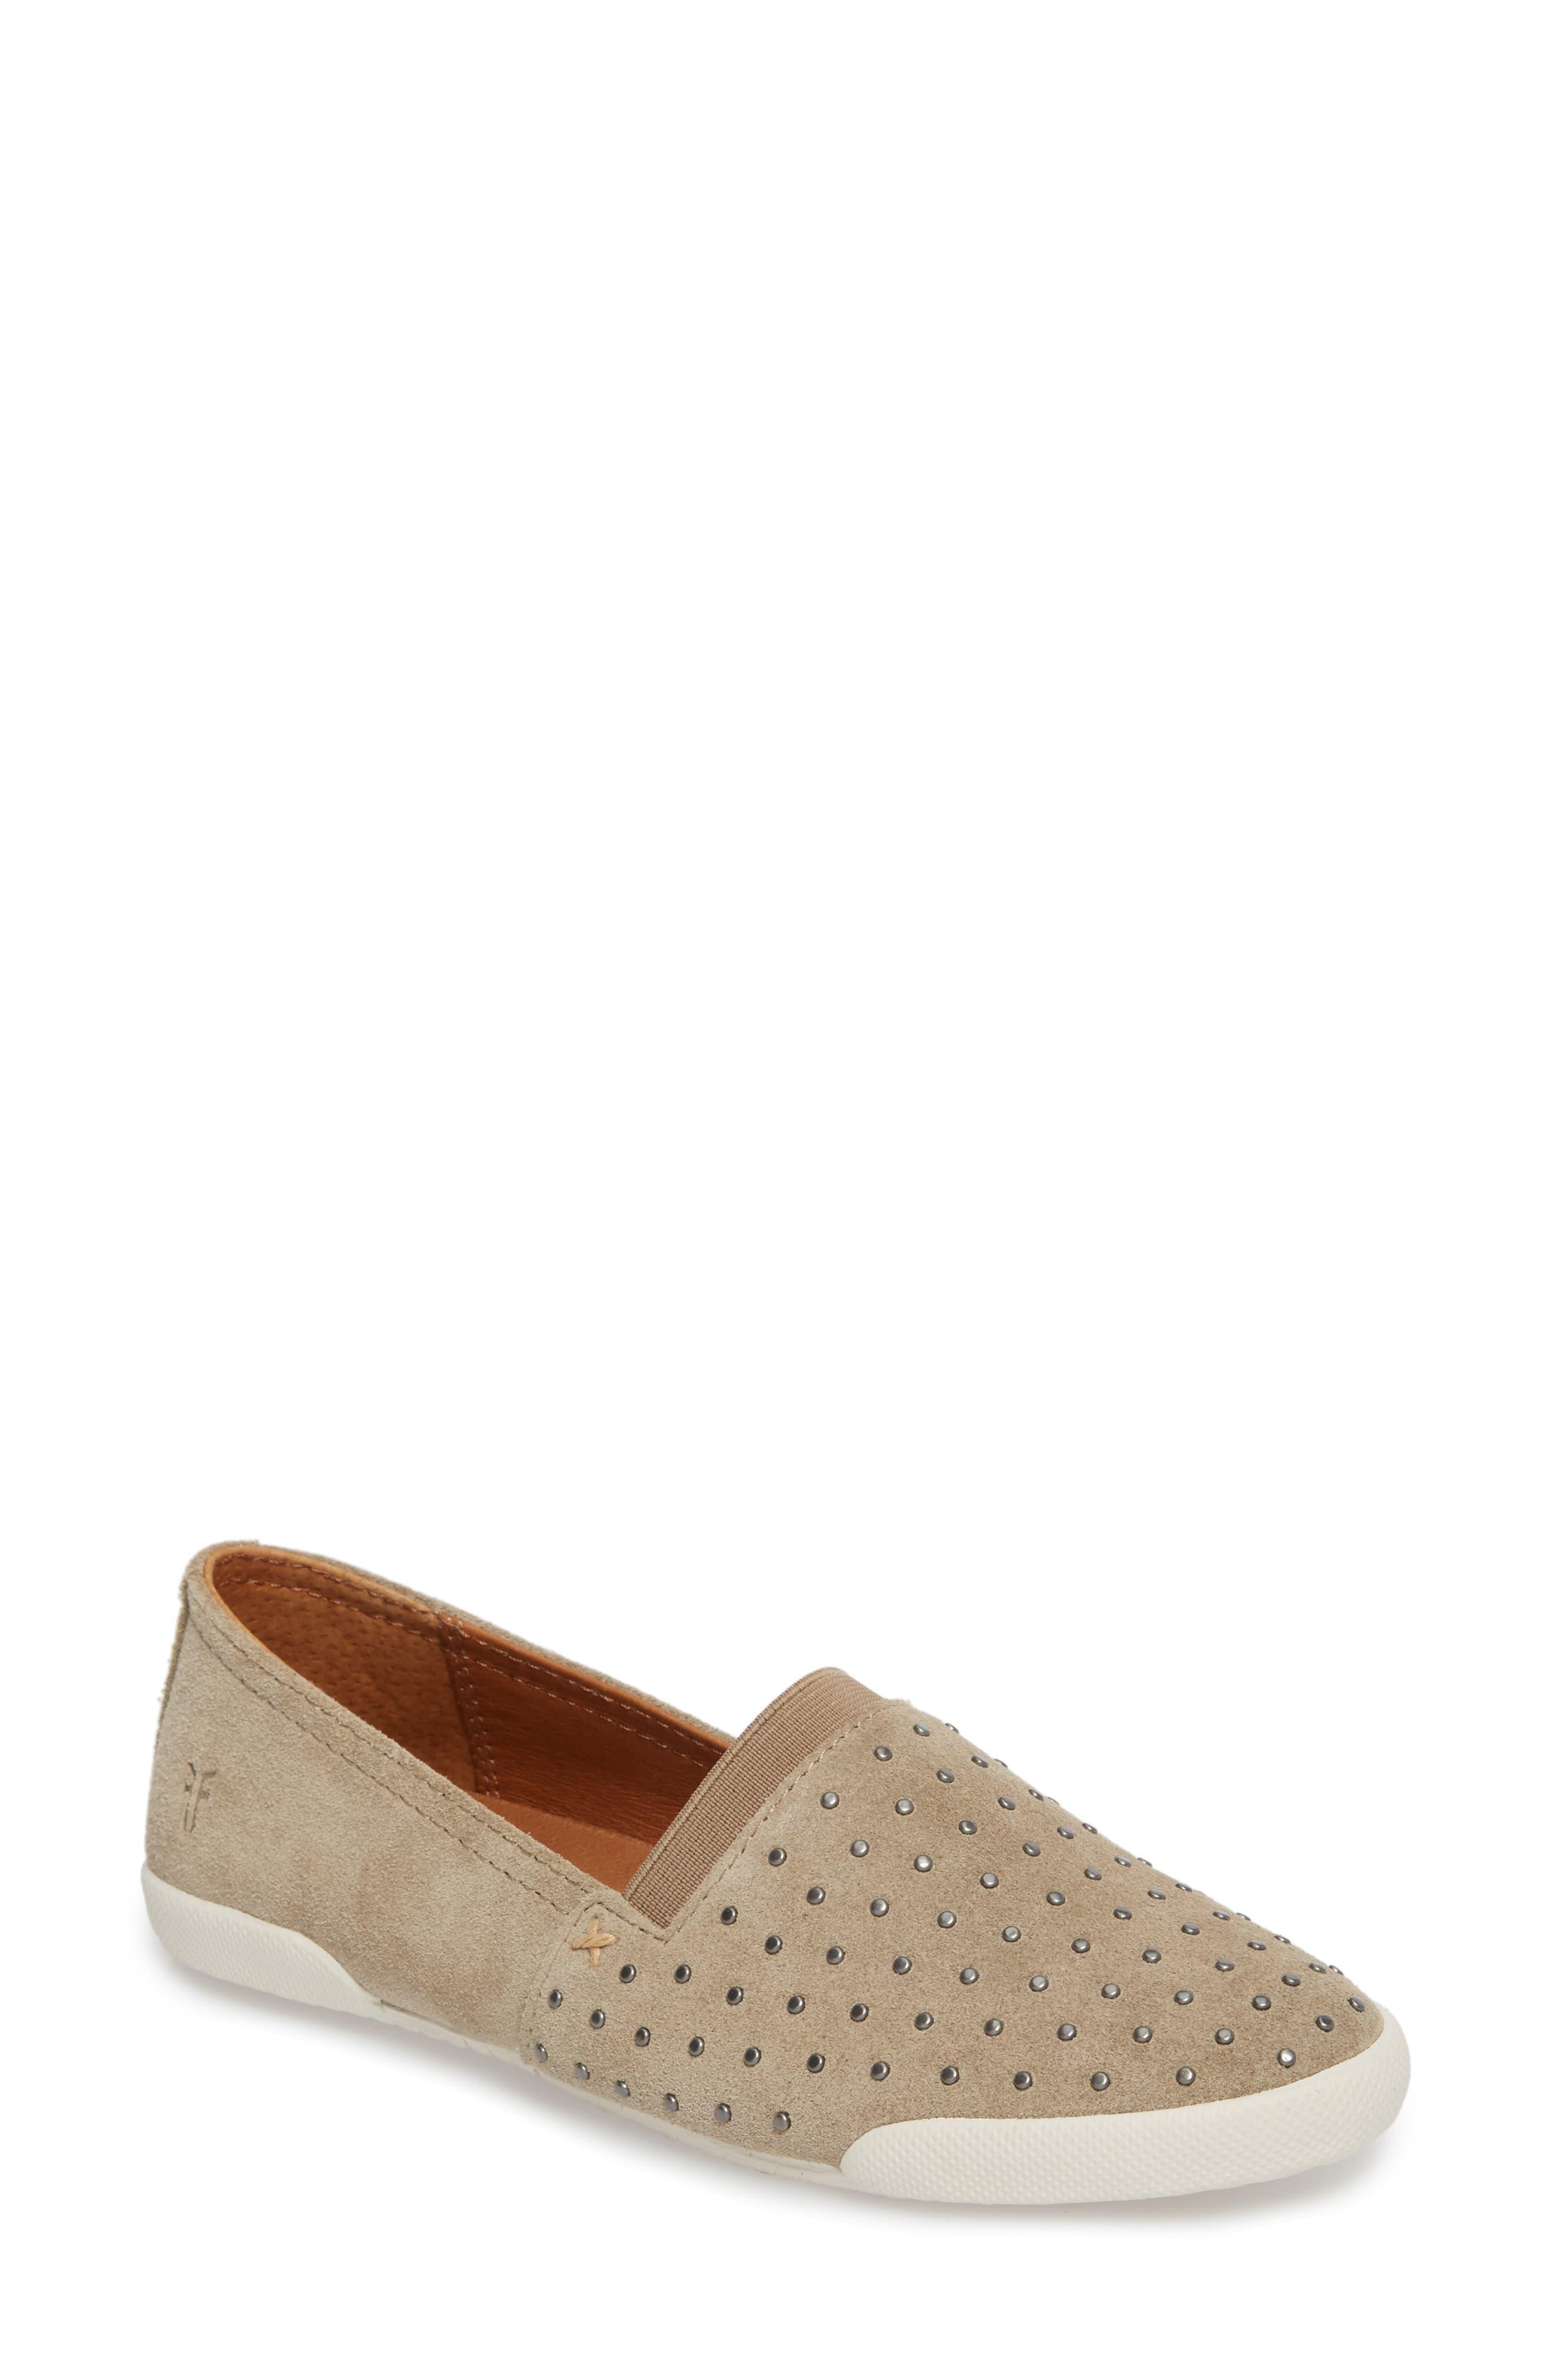 Melanie Stud Slip-On Sneaker,                         Main,                         color, ASH